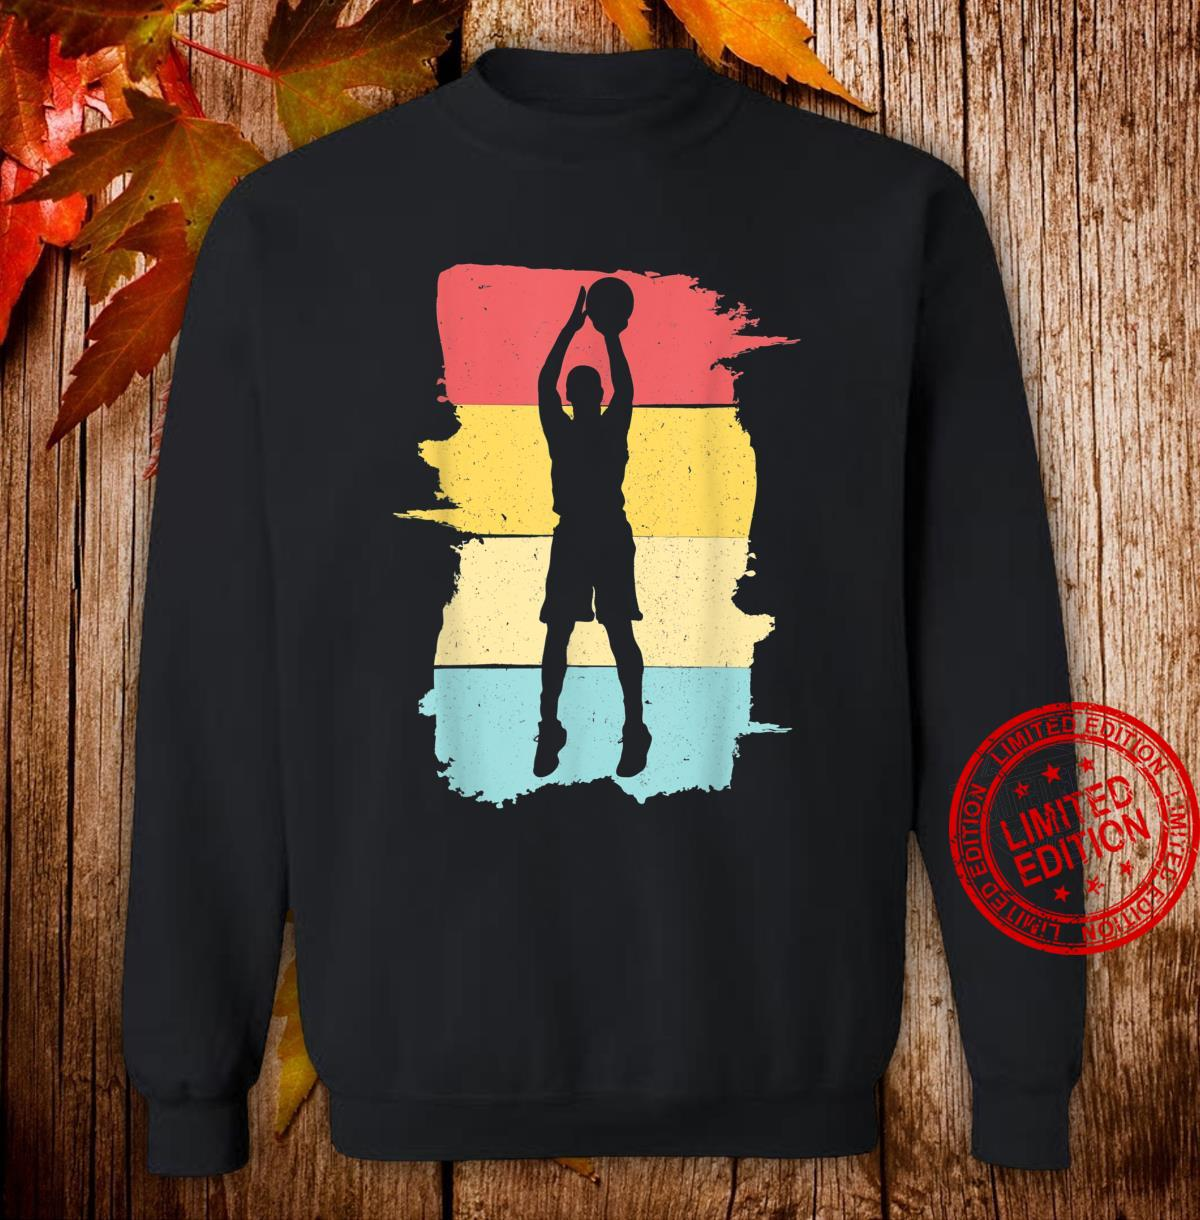 Retro Basketball Basketballspieler Geschenk für Junge Jungen Shirt sweater